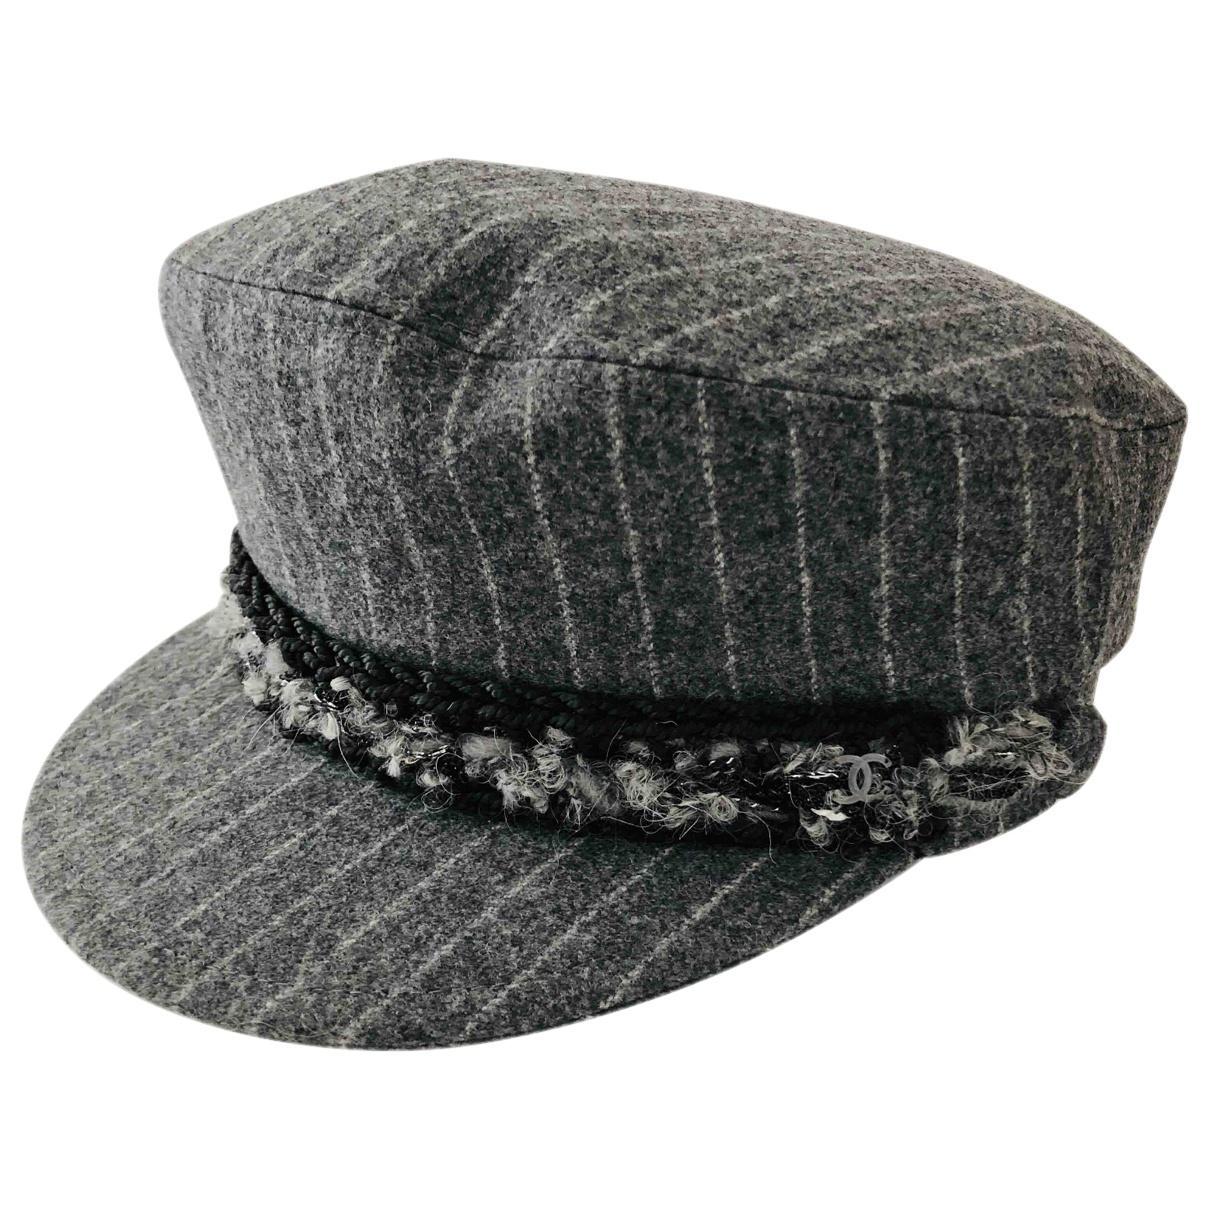 Lyst - Chanel Wool Hat in Gray b88971a0bf9